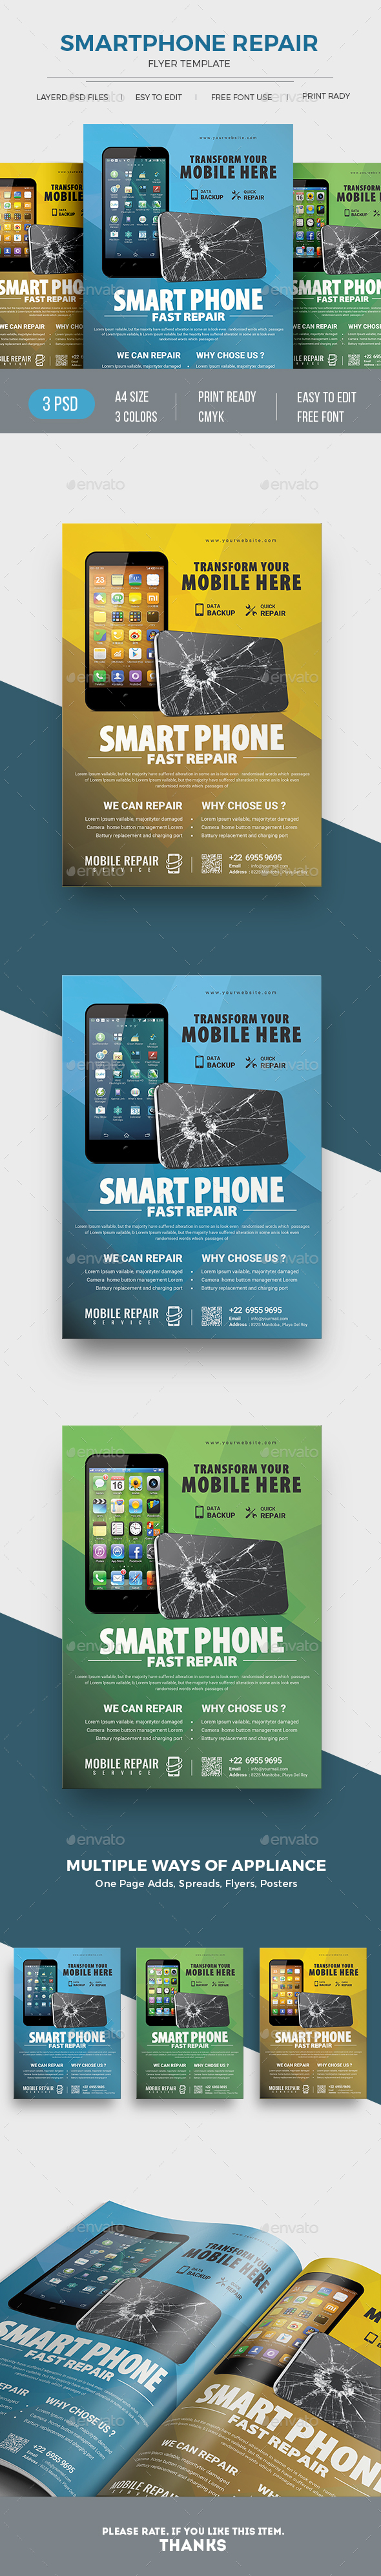 Smartphone Repair Service Flyer - Commerce Flyers